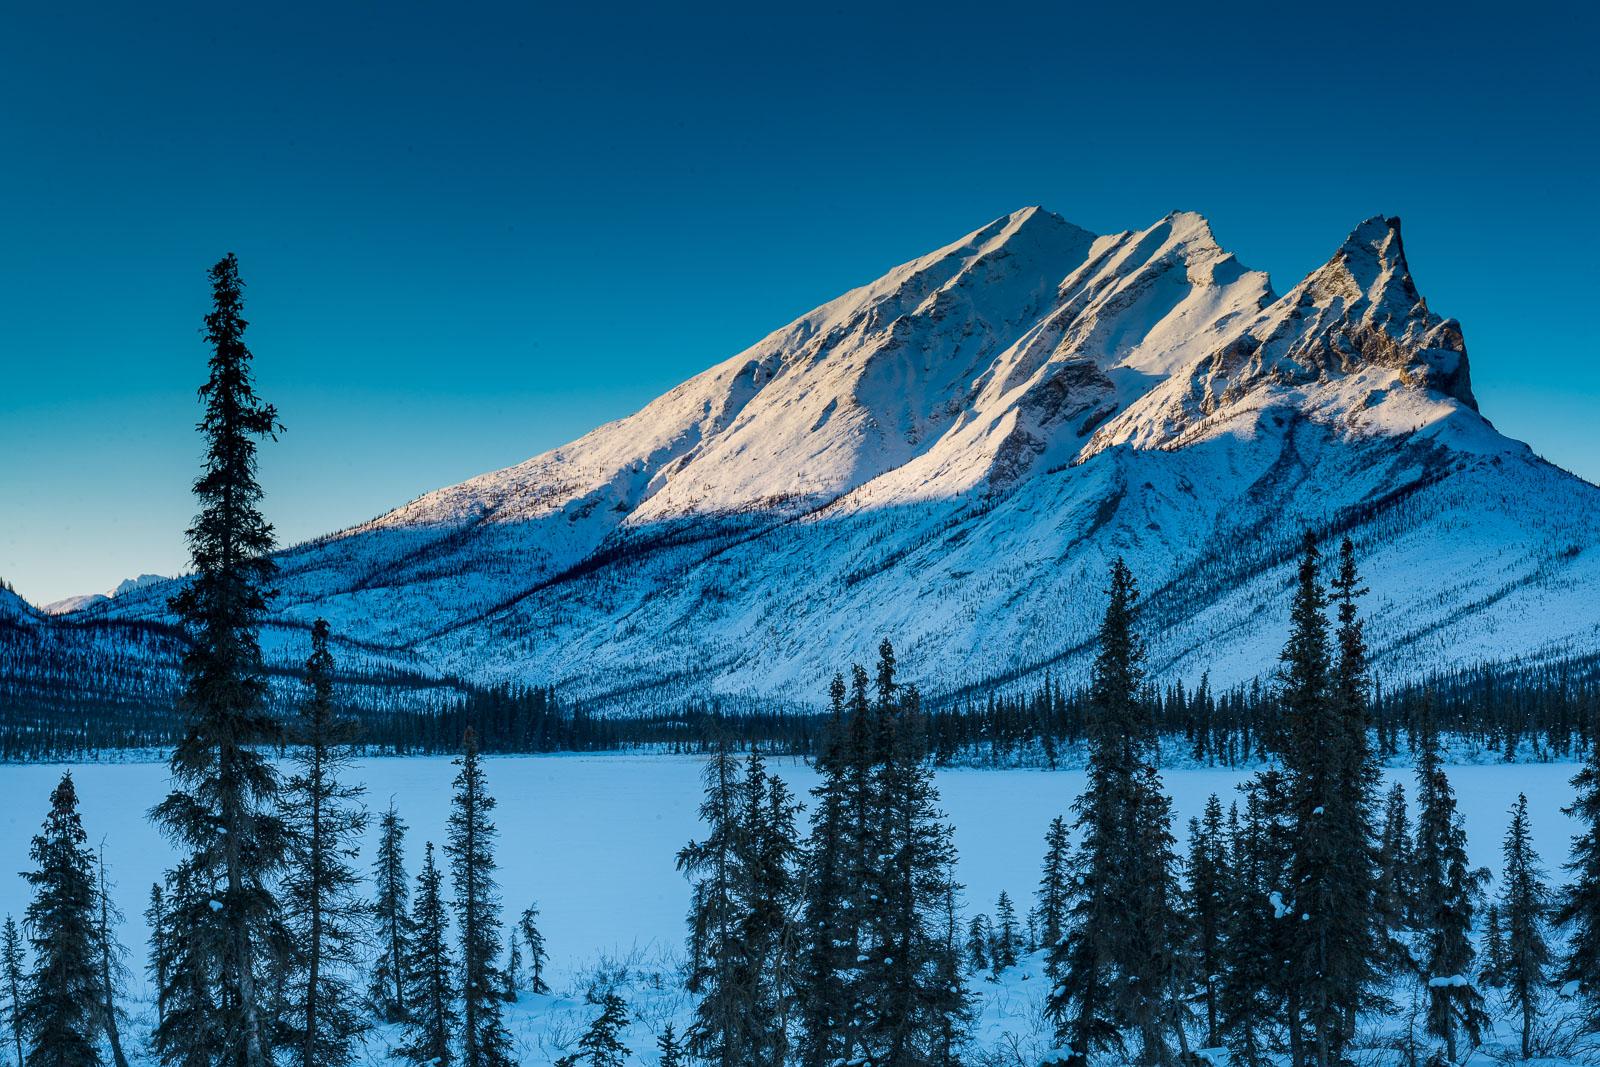 Morning light shines on the north face of Sukakpak Mountain in the Brooks Range, Alaska.